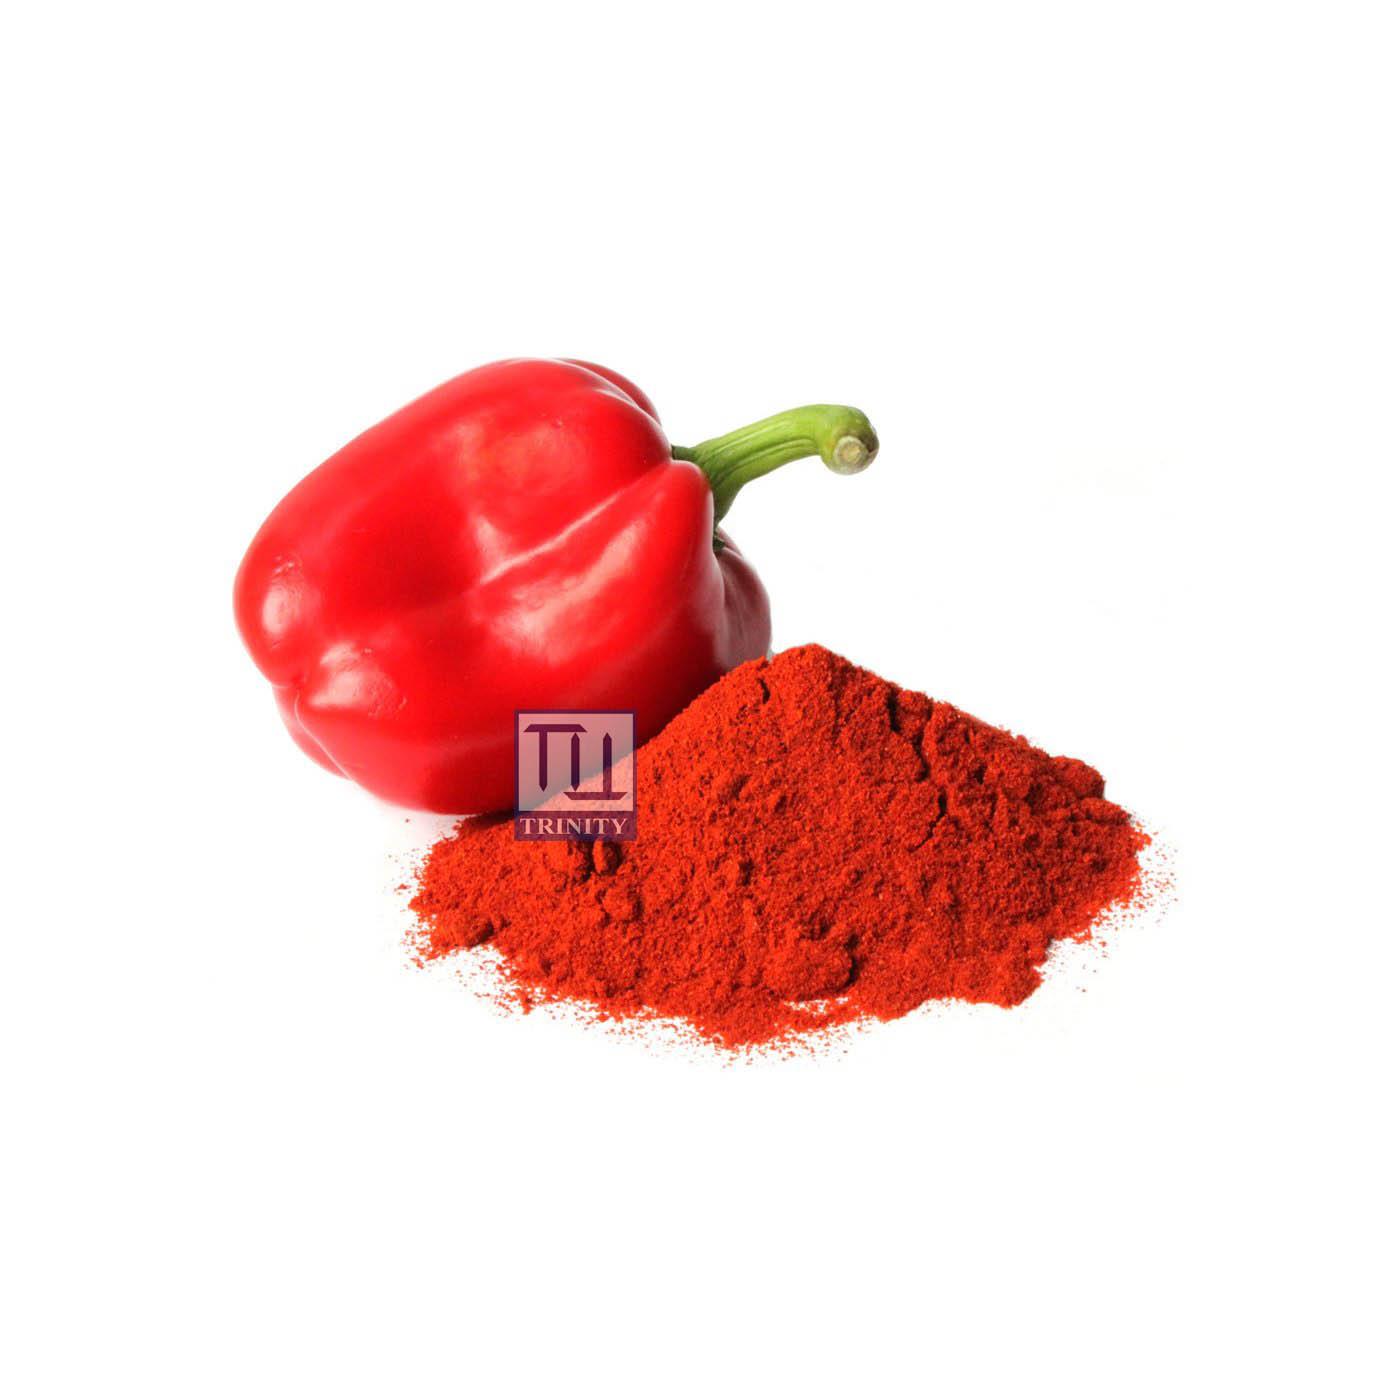 Paprika Powder  匈牙利辣椒粉